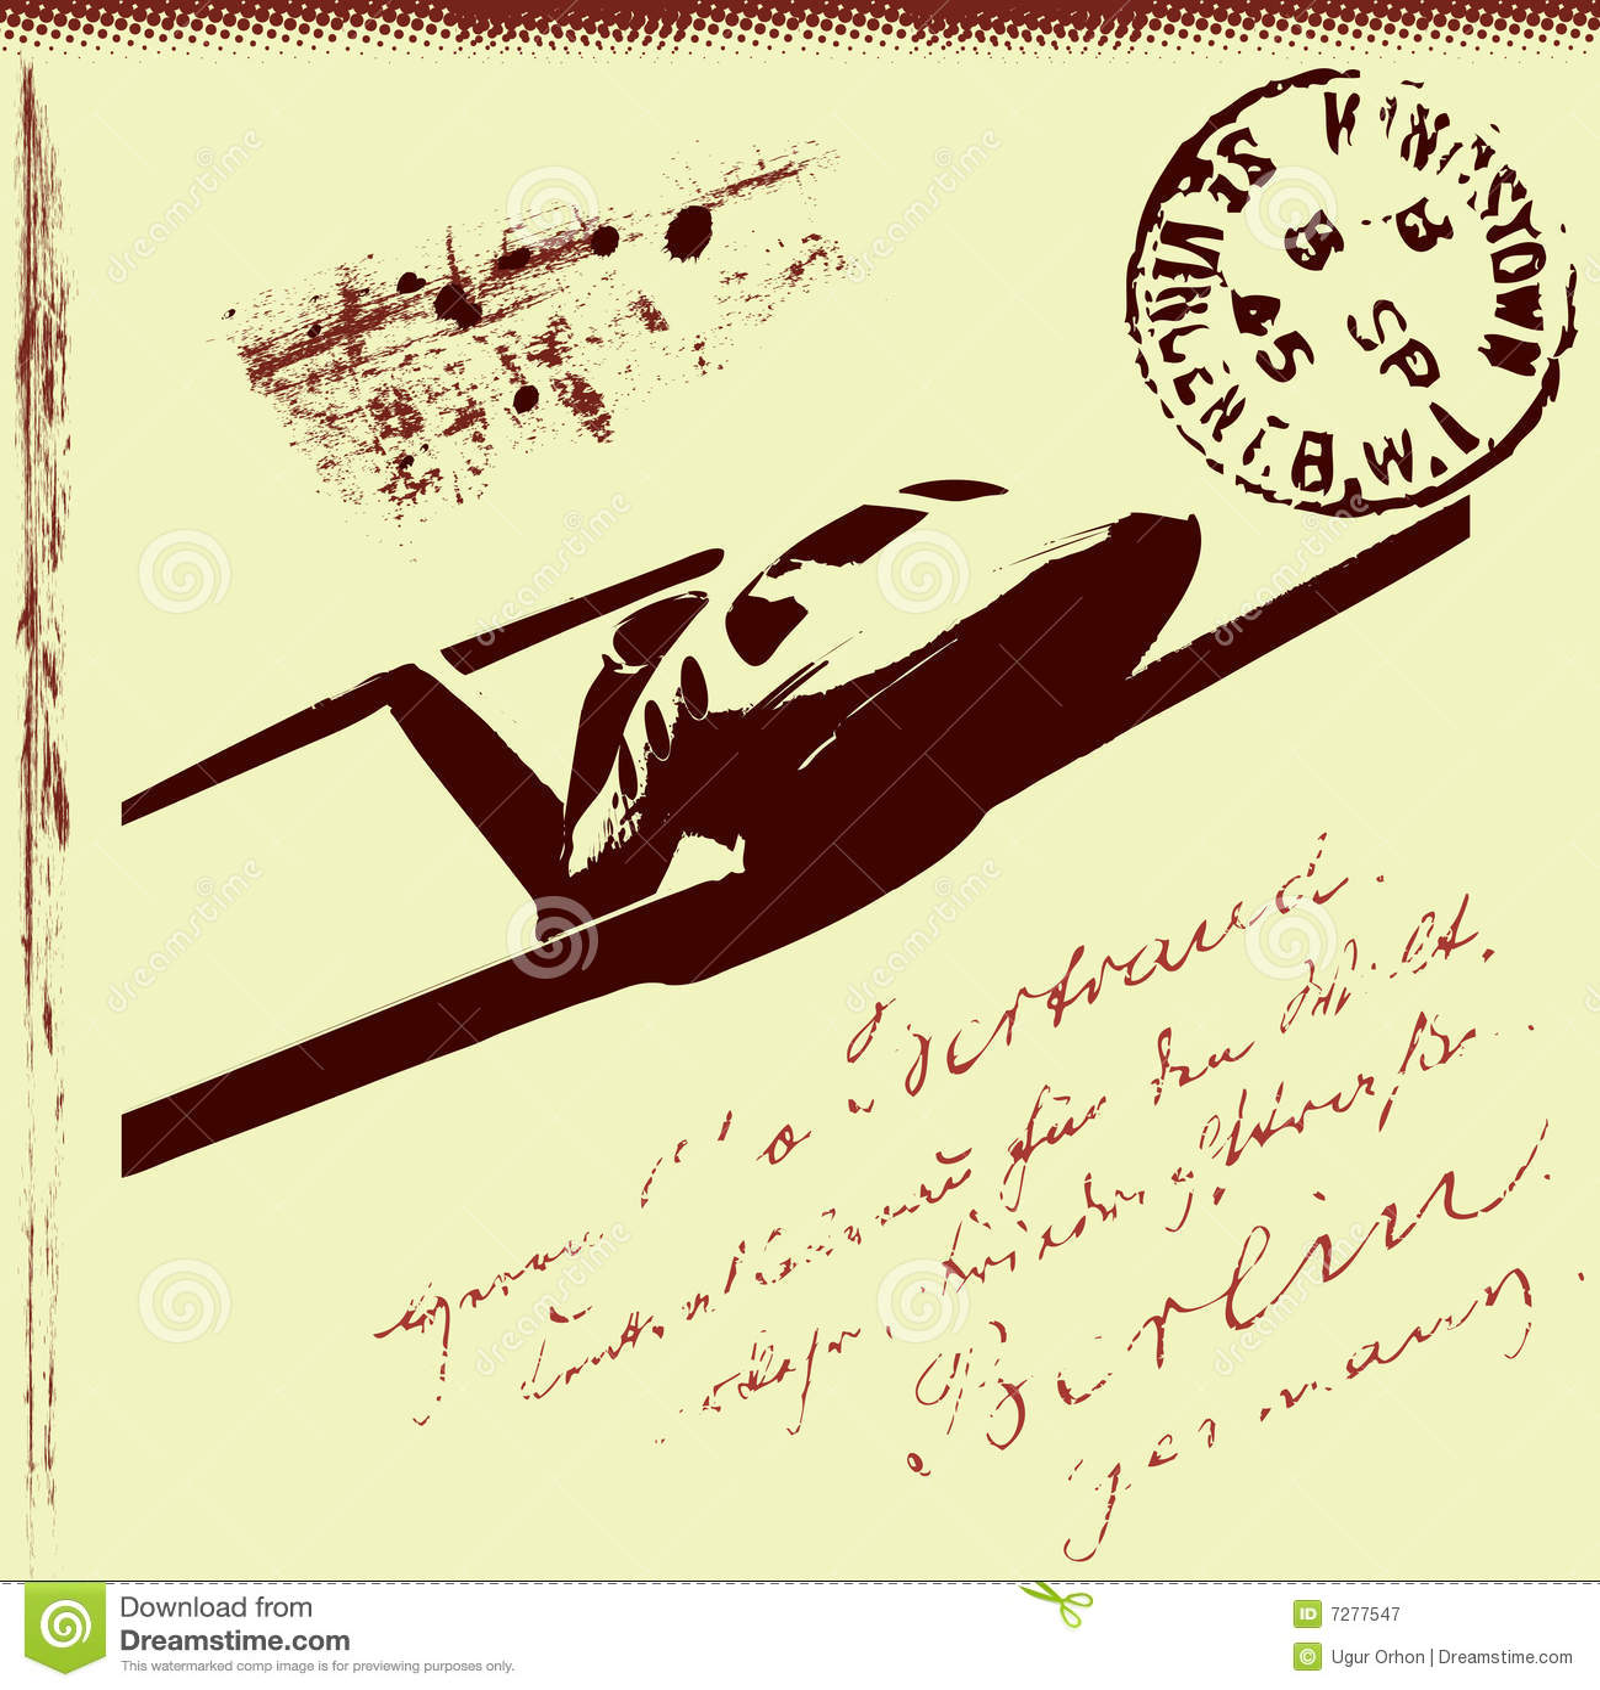 Fondo postal abstracto